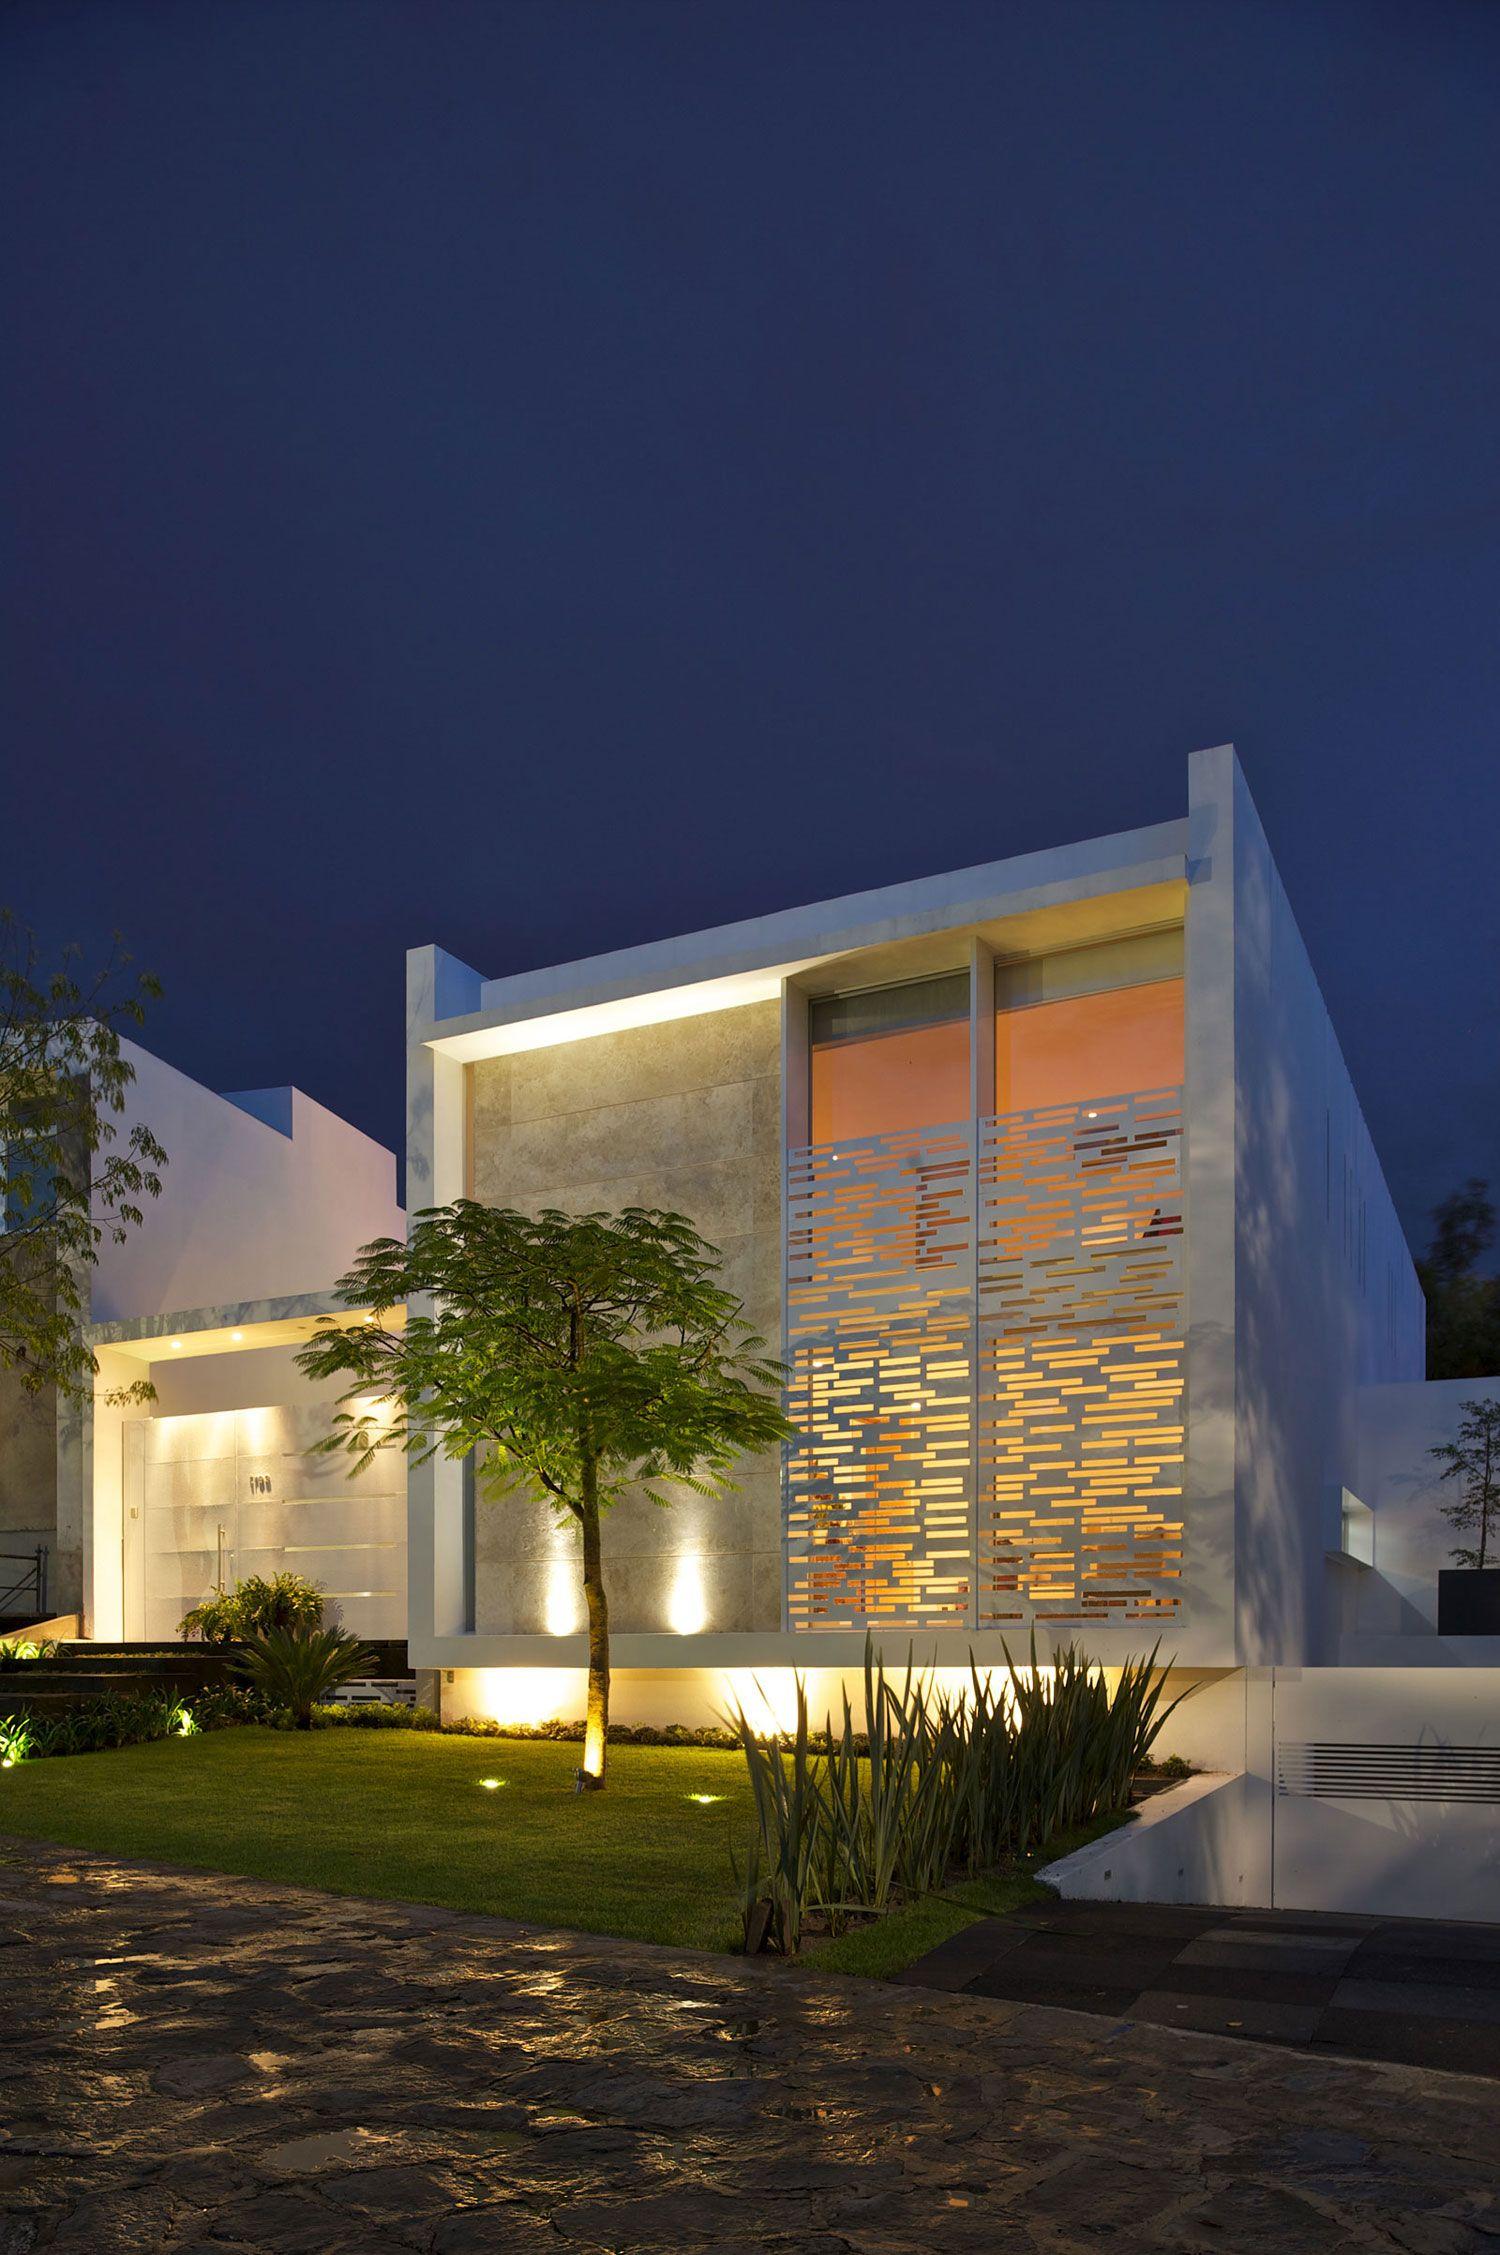 Casa natalia by agraz arquitectos